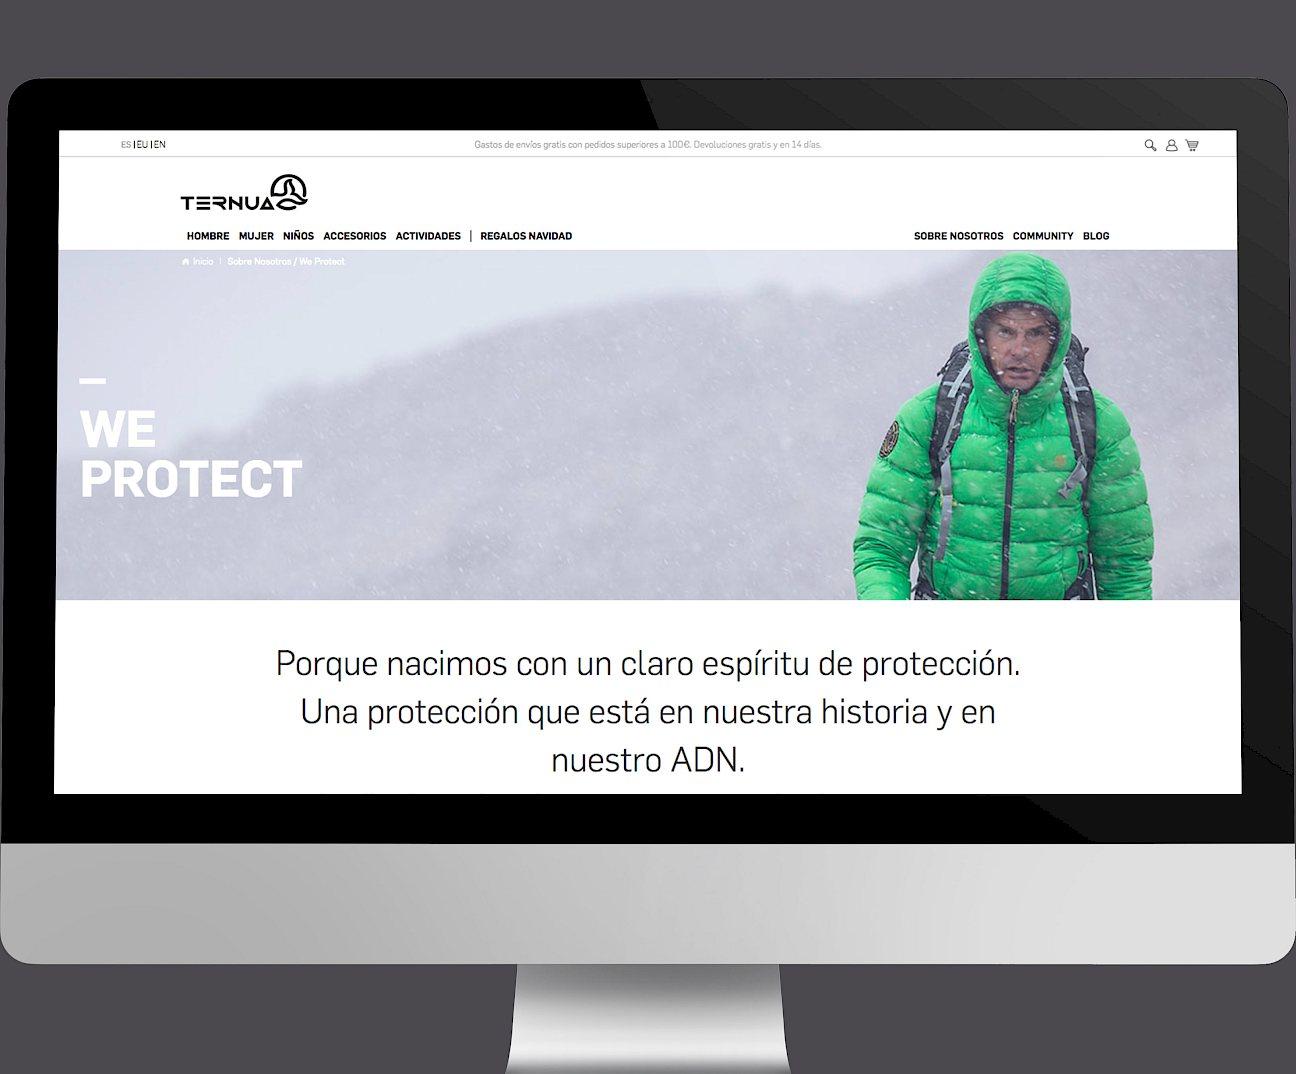 ternua website move digital branding wireframe 06 design